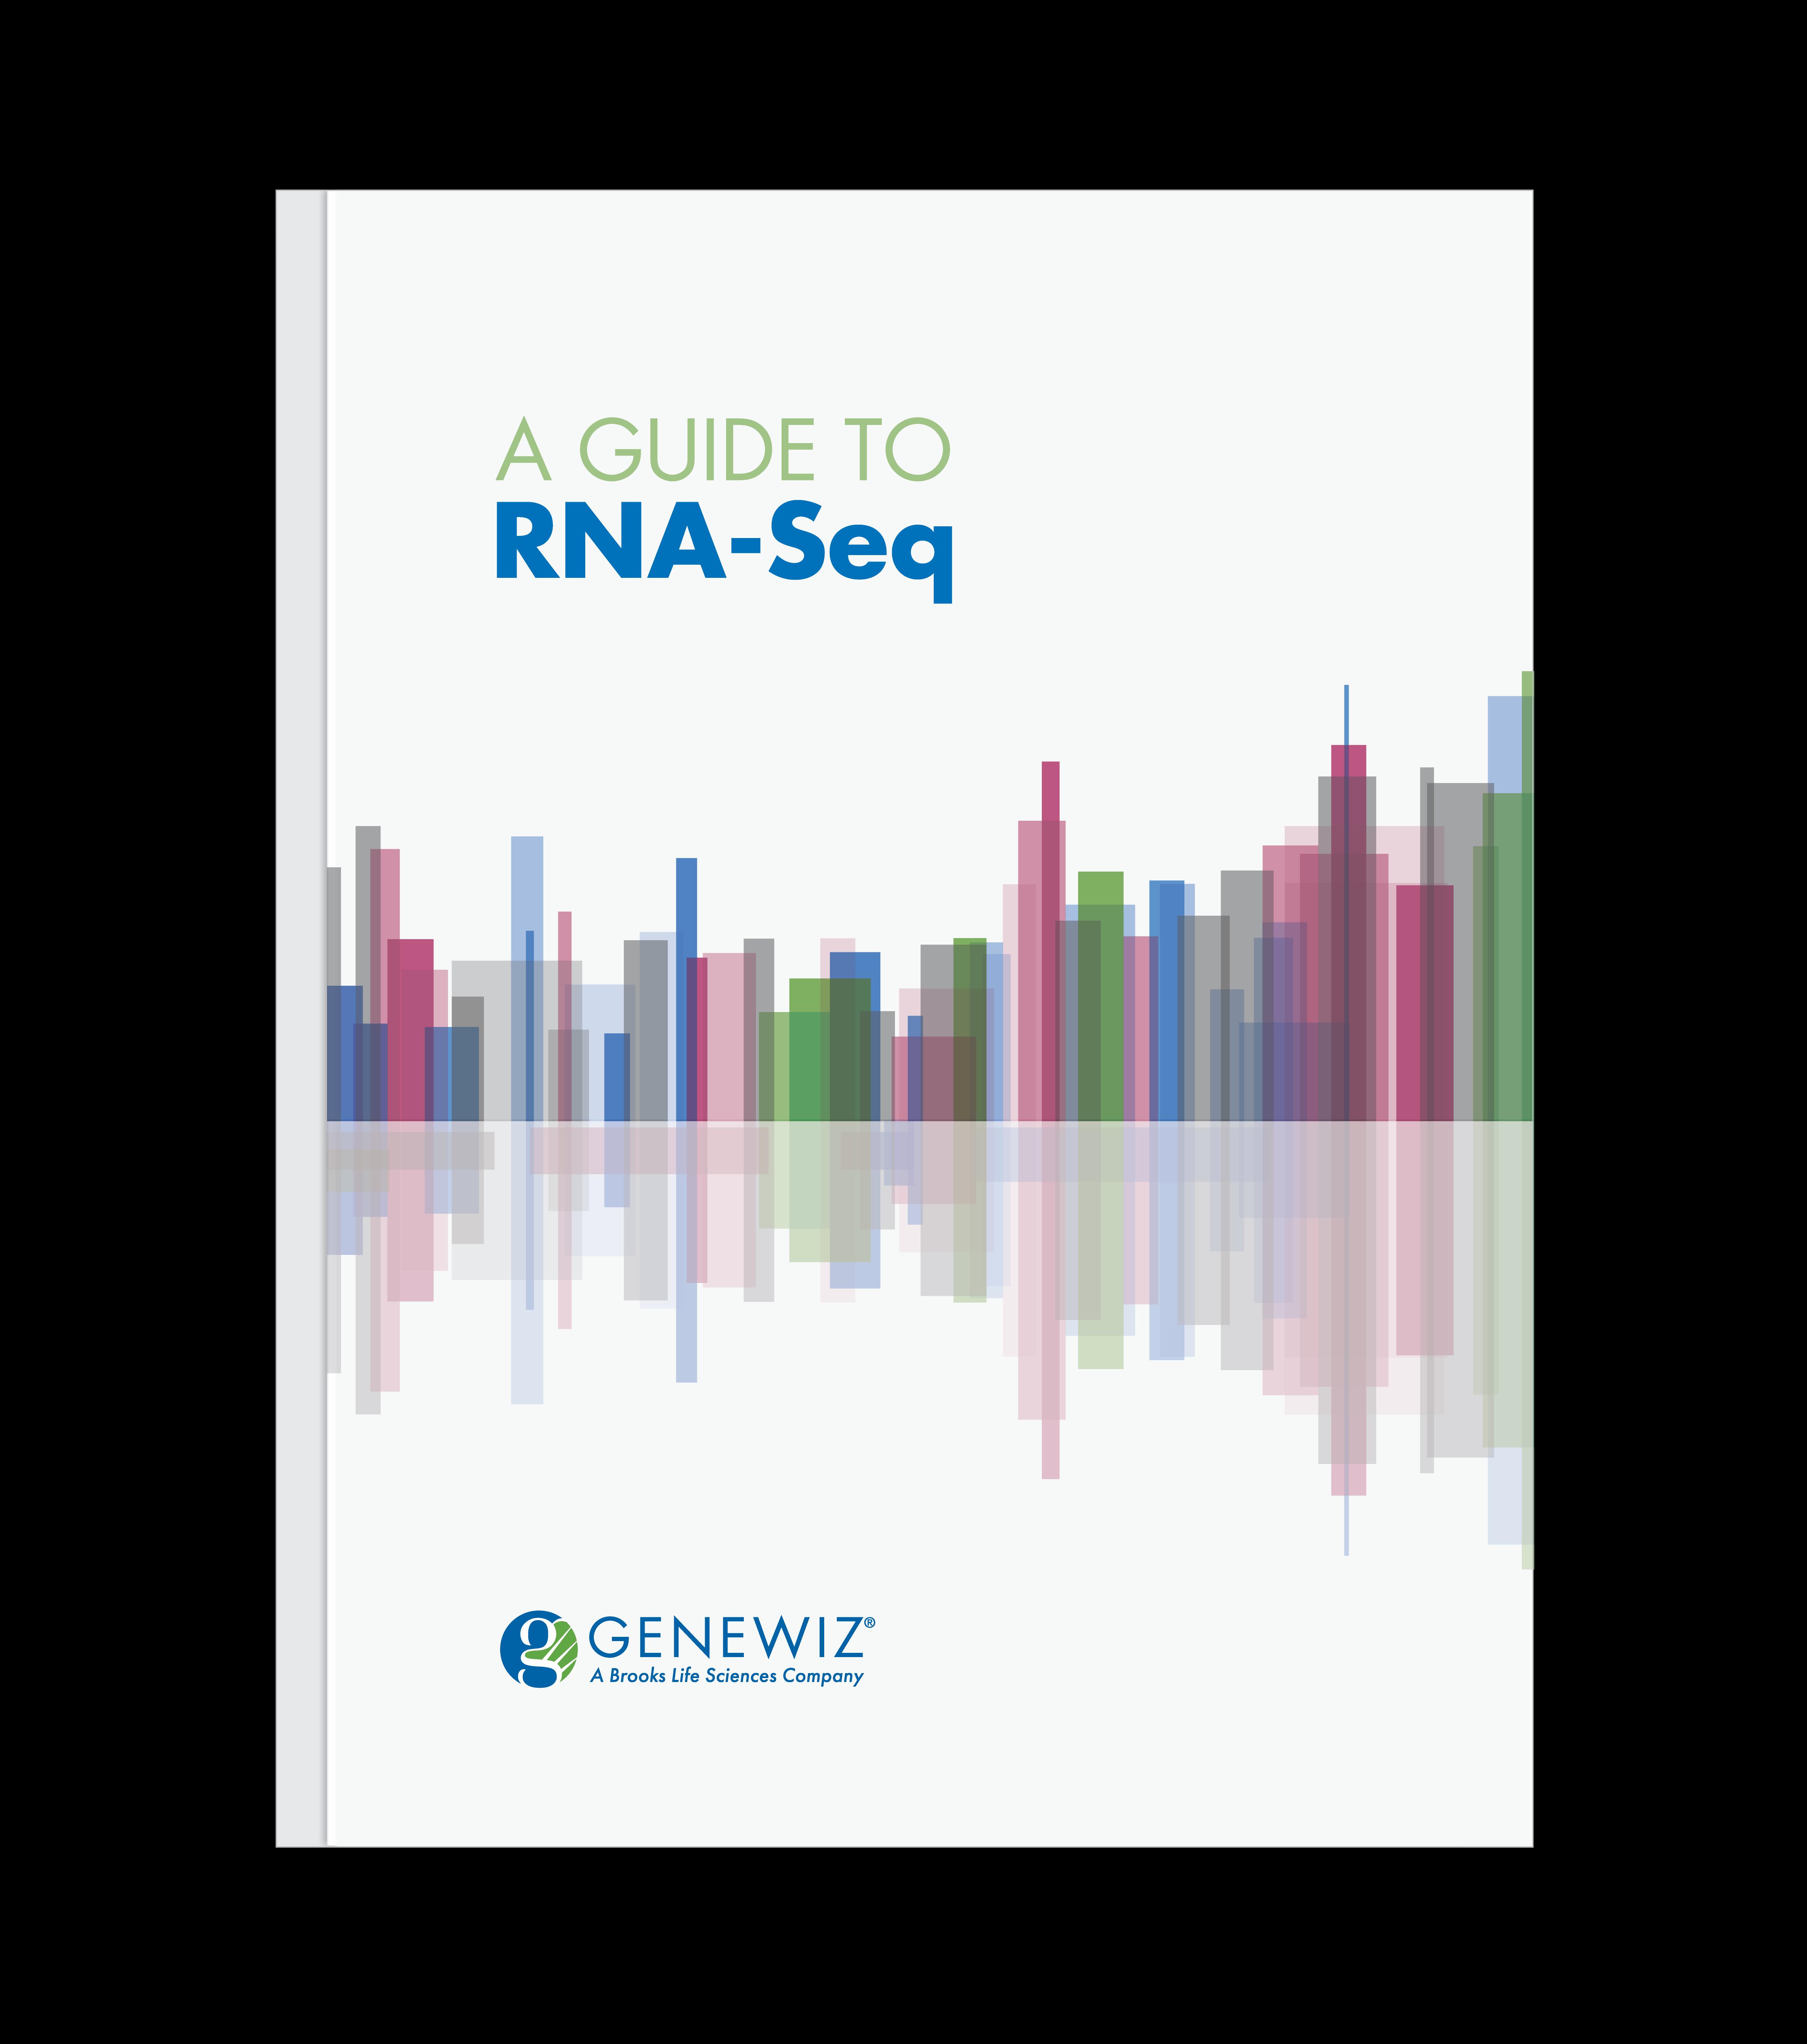 A Guide to RNA-Seq eBook Thumbnail Image